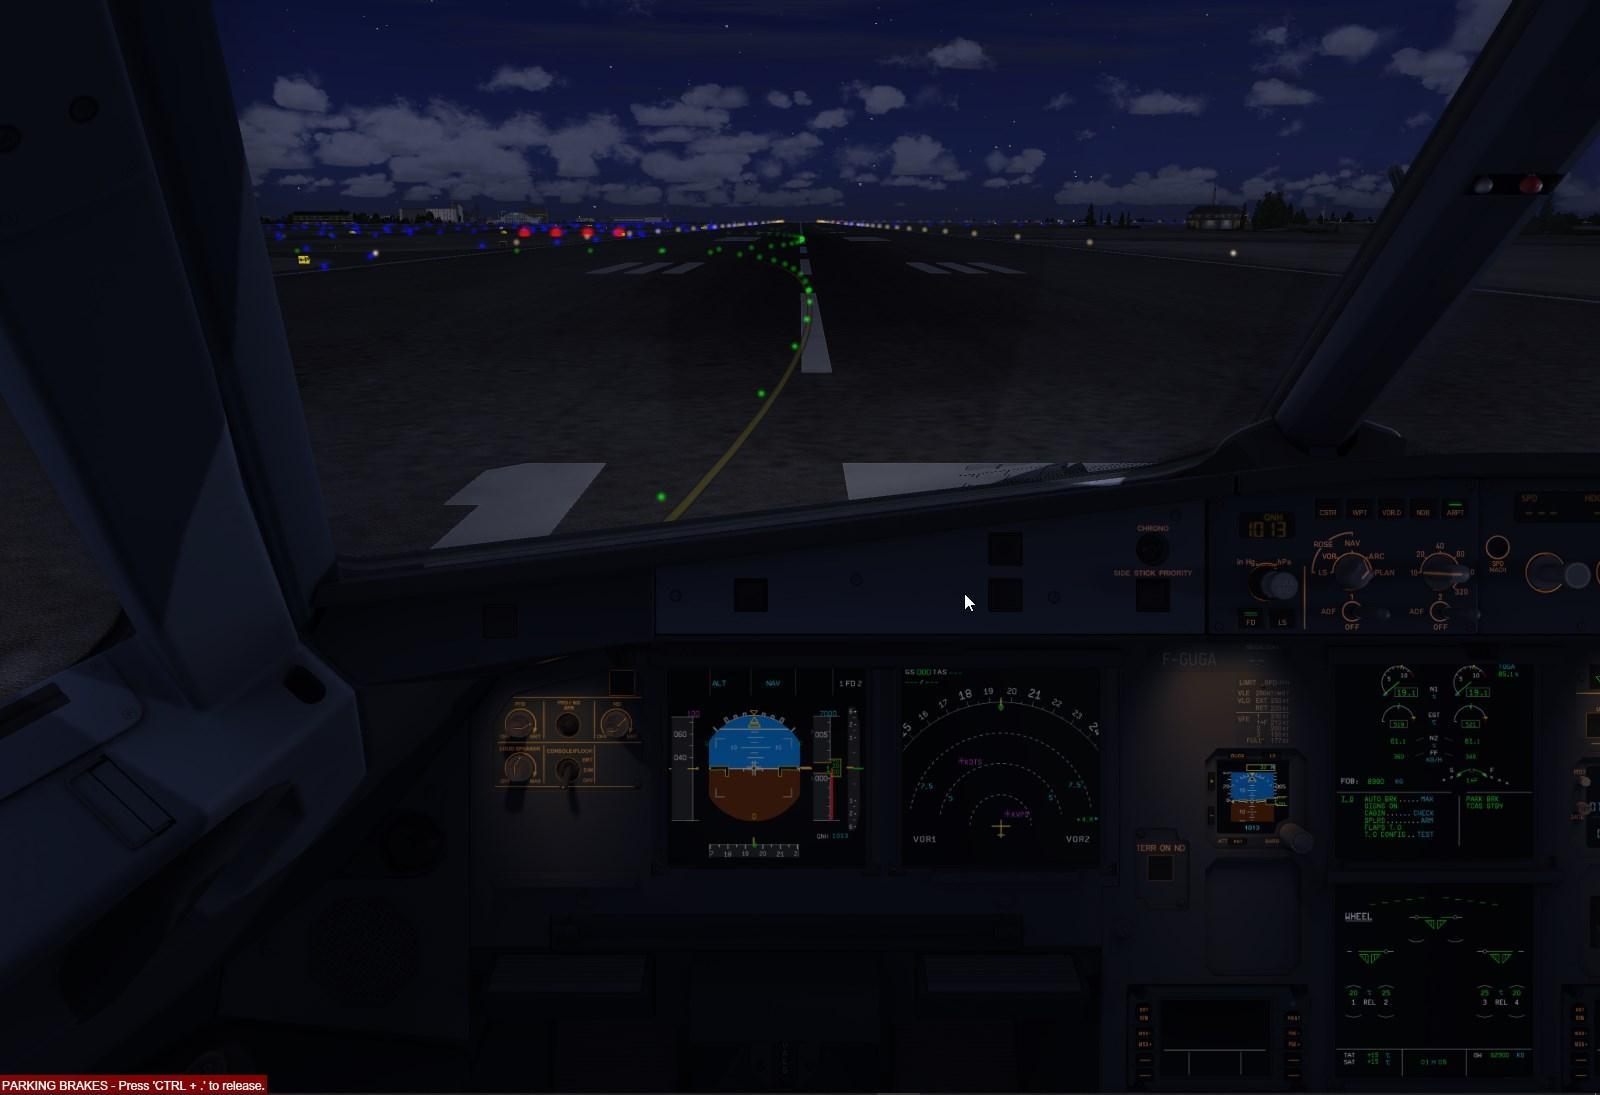 Airbus Professional - Everything else - AEROSOFT COMMUNITY SERVICES